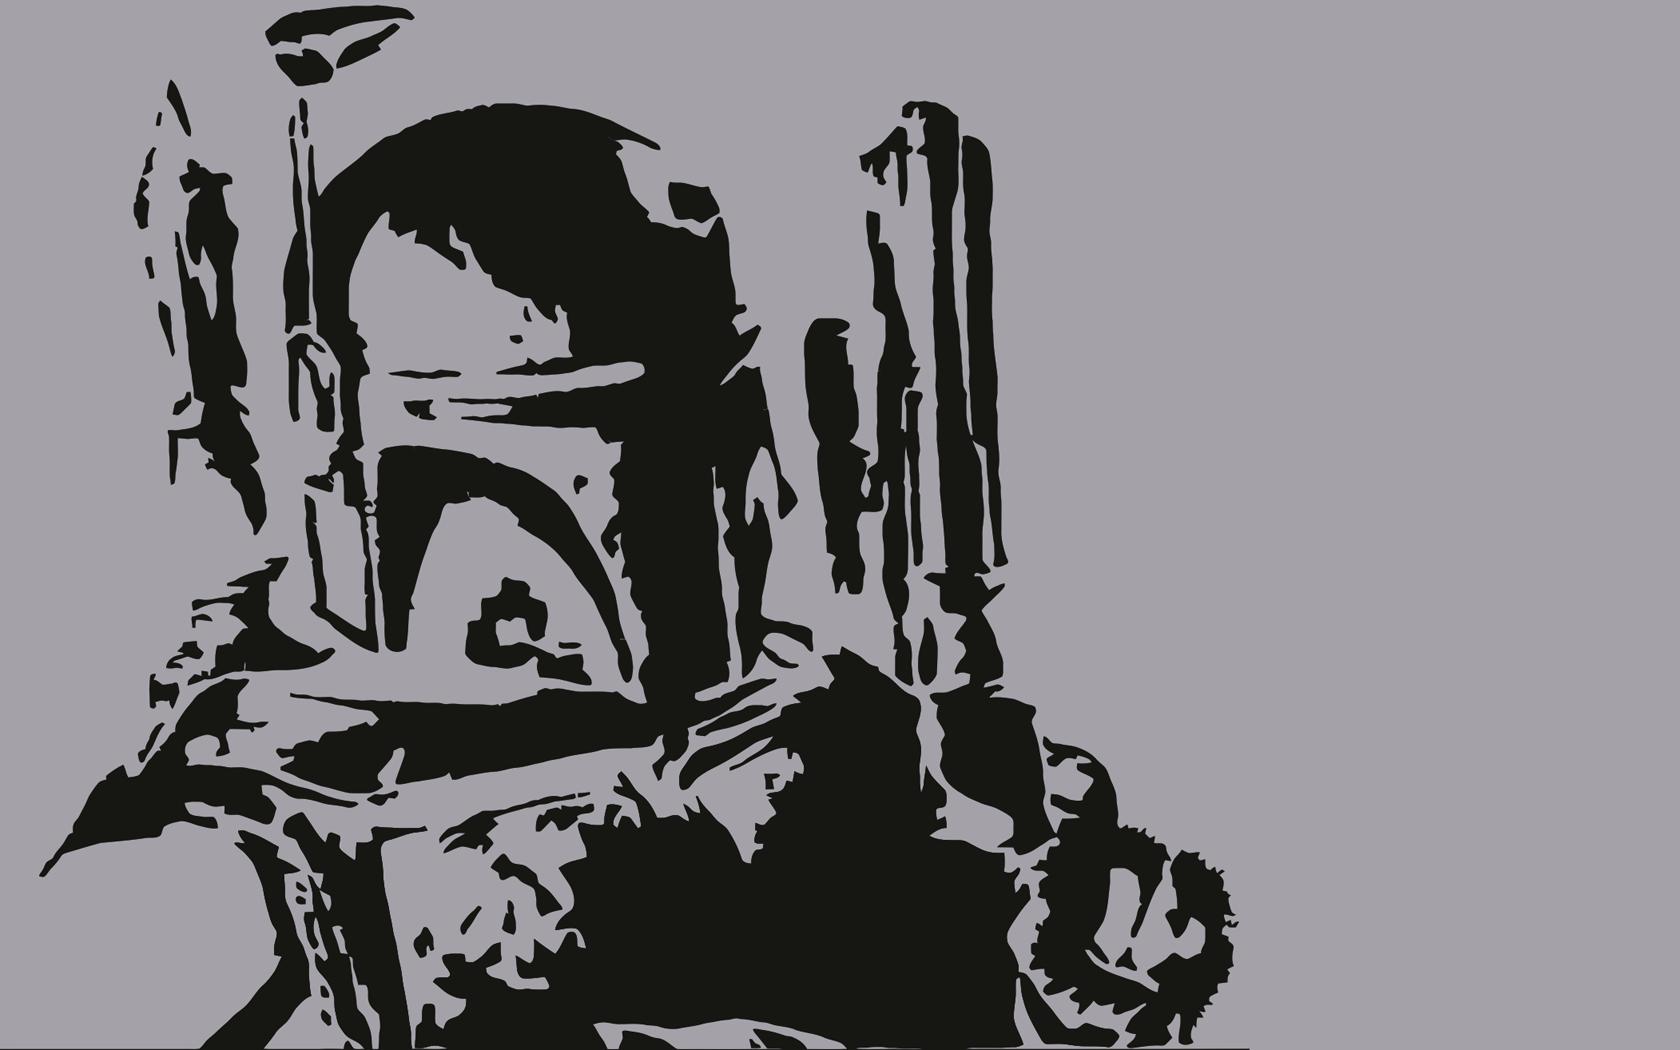 Boba Fett Star Wars Wallpaper 1680x1050 104079 Wallpaperup